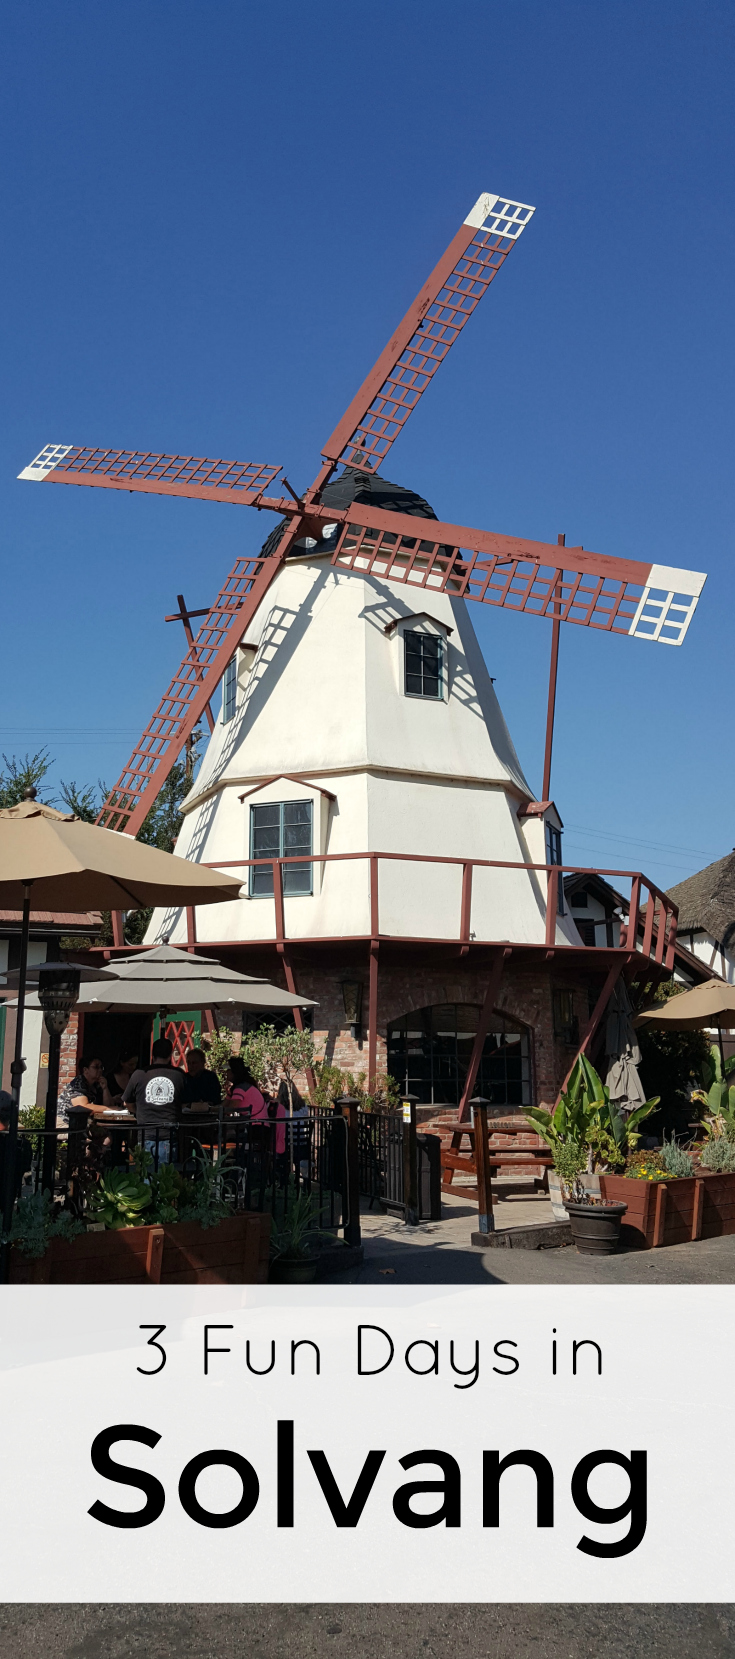 3 Fun Days in Solvang USA - Little Denmark in California